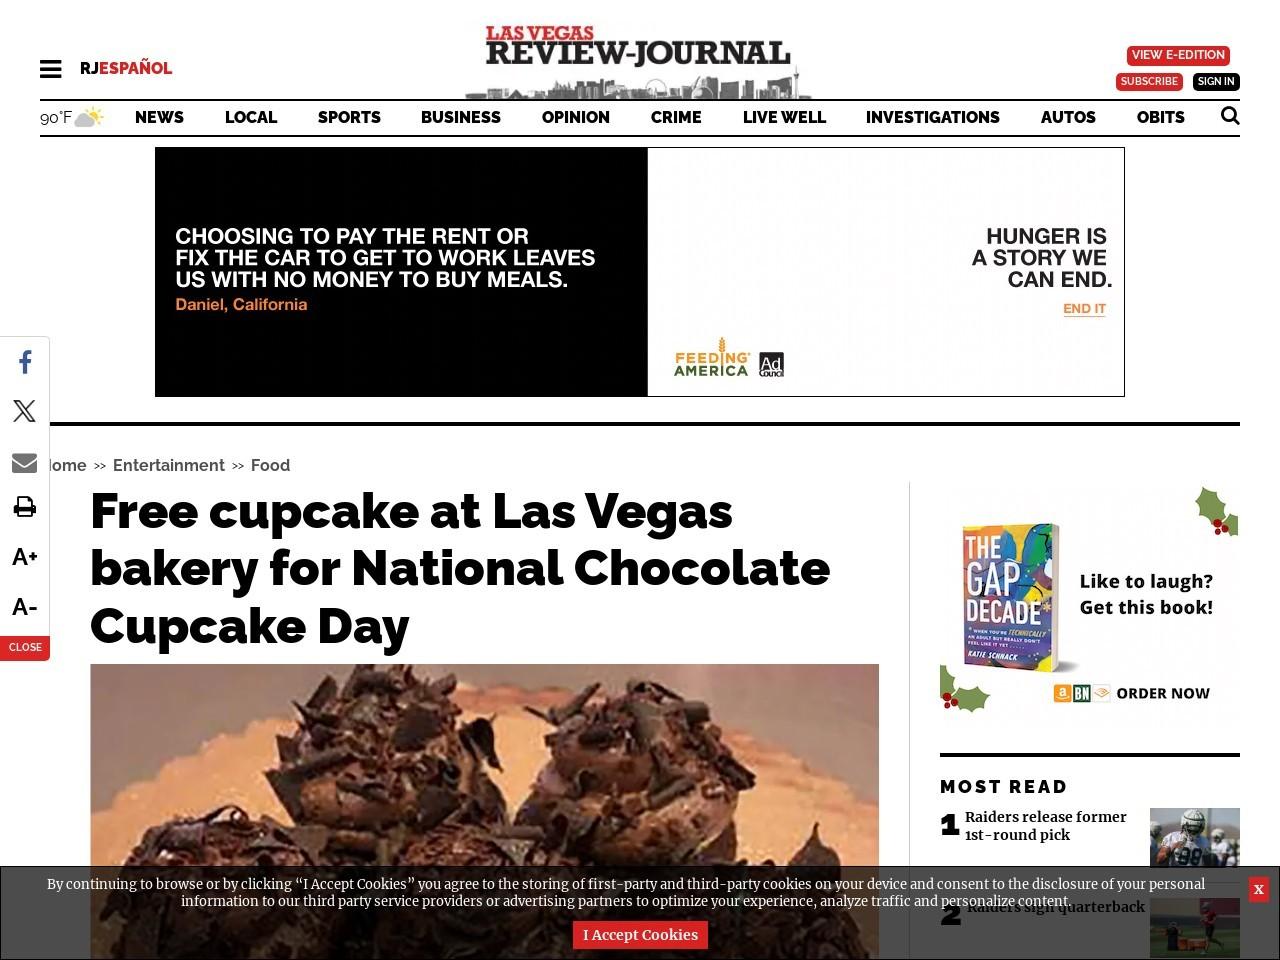 Free cupcake at Las Vegas bakery for National Chocolate Cupcake Day